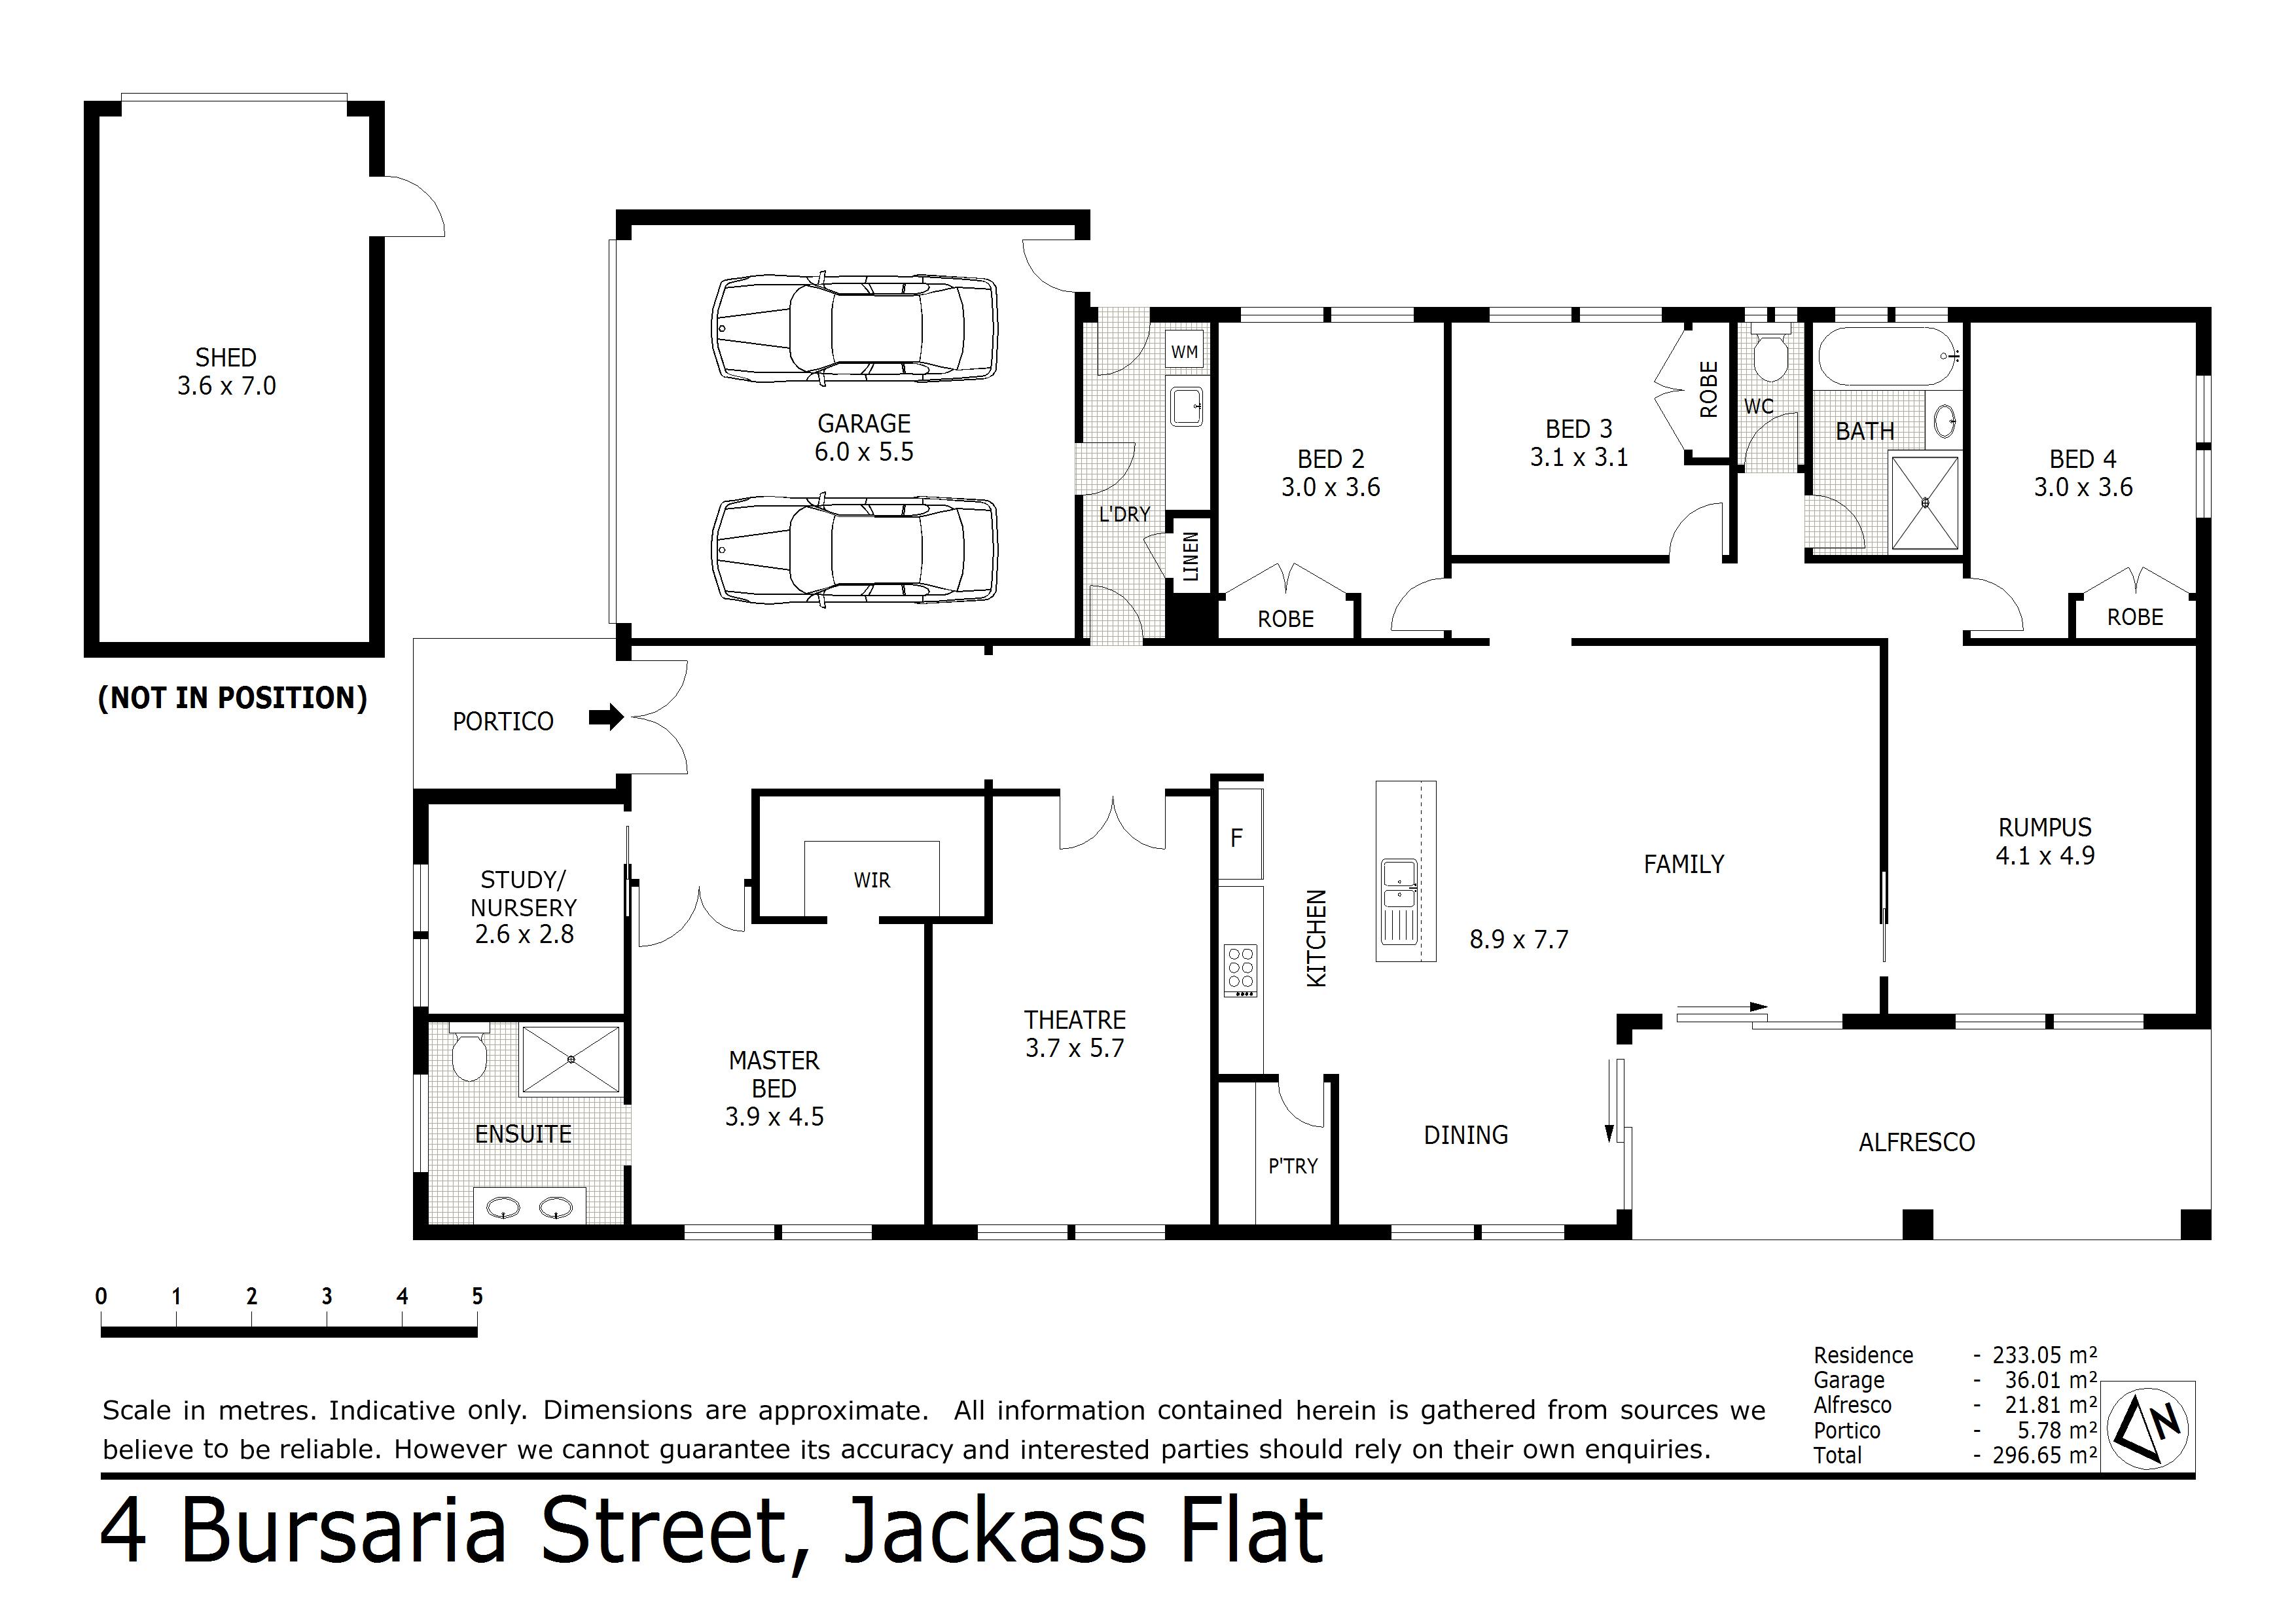 4 Bursaria Street, Jackass Flat, VIC 3556